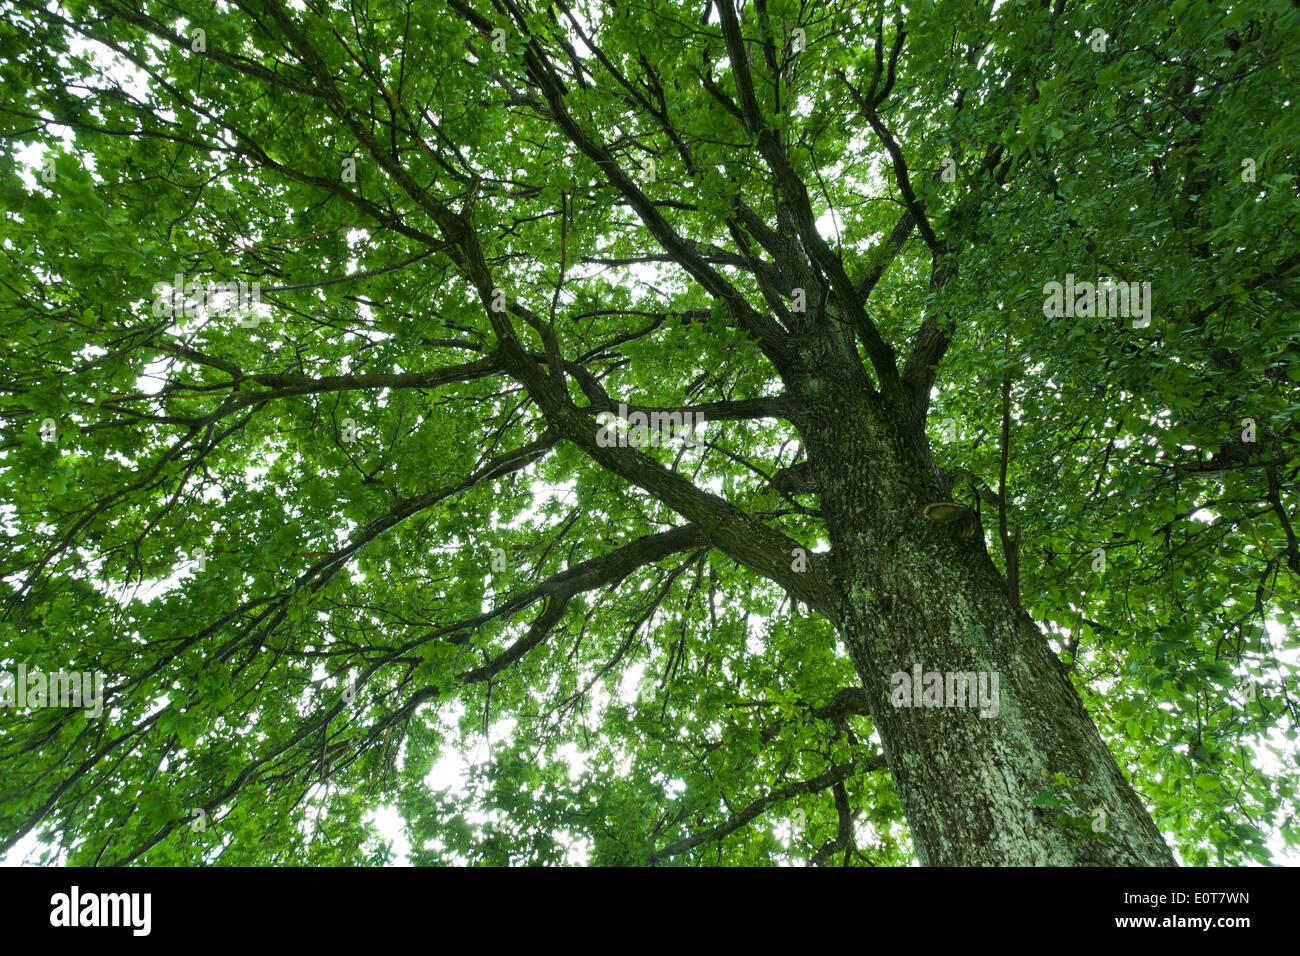 Laubbaum, Baumkrone - Broadleaf tree, treetop - Stock Image